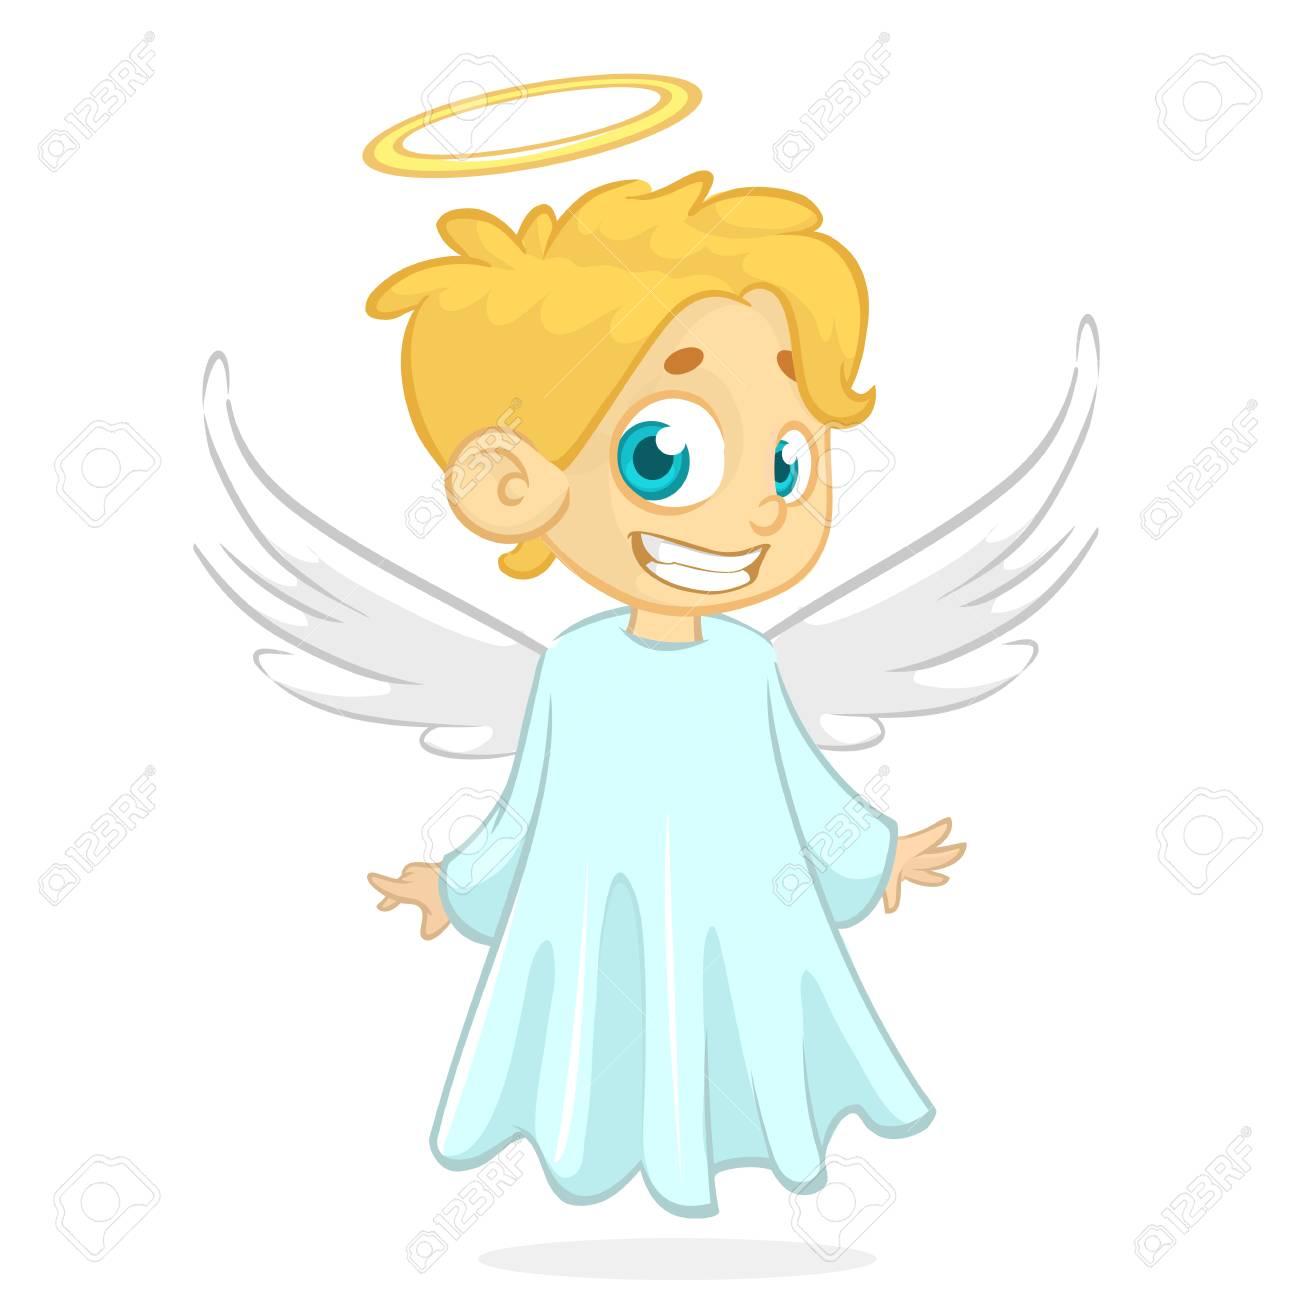 Christmas Angel.Vector Cartoon Illustration Of Christmas Angel With Nimbus And